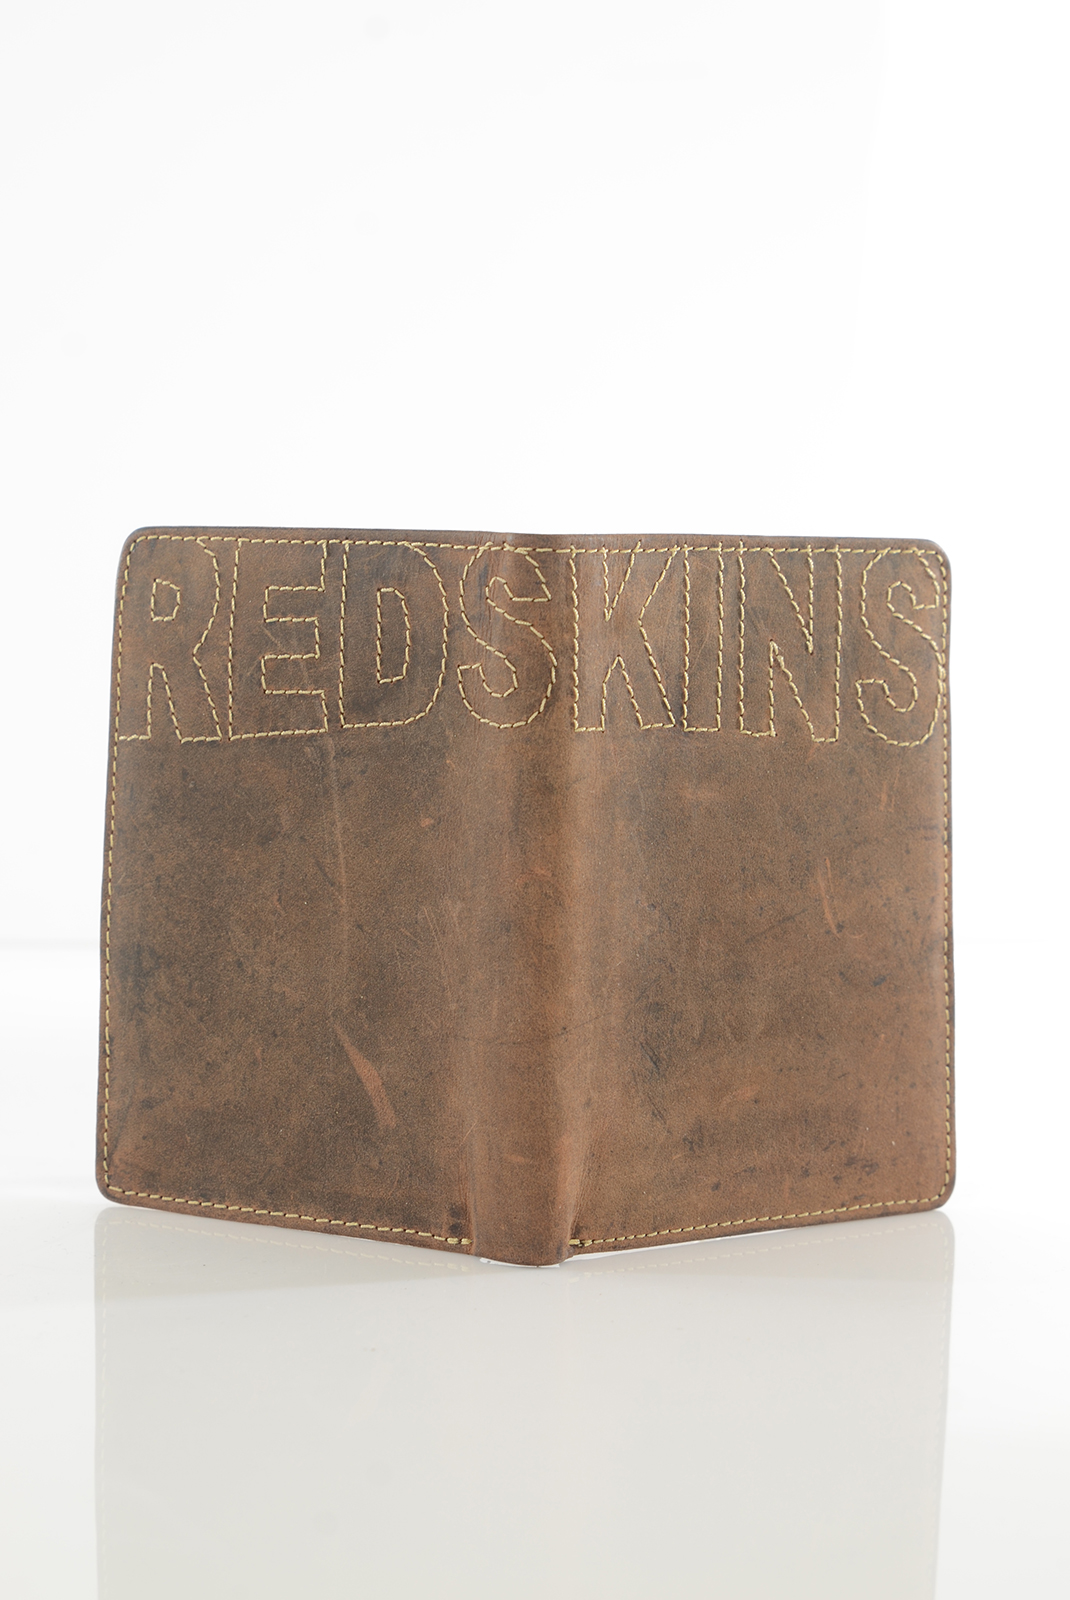 Accessoires   Redskins DAKATO MARRON